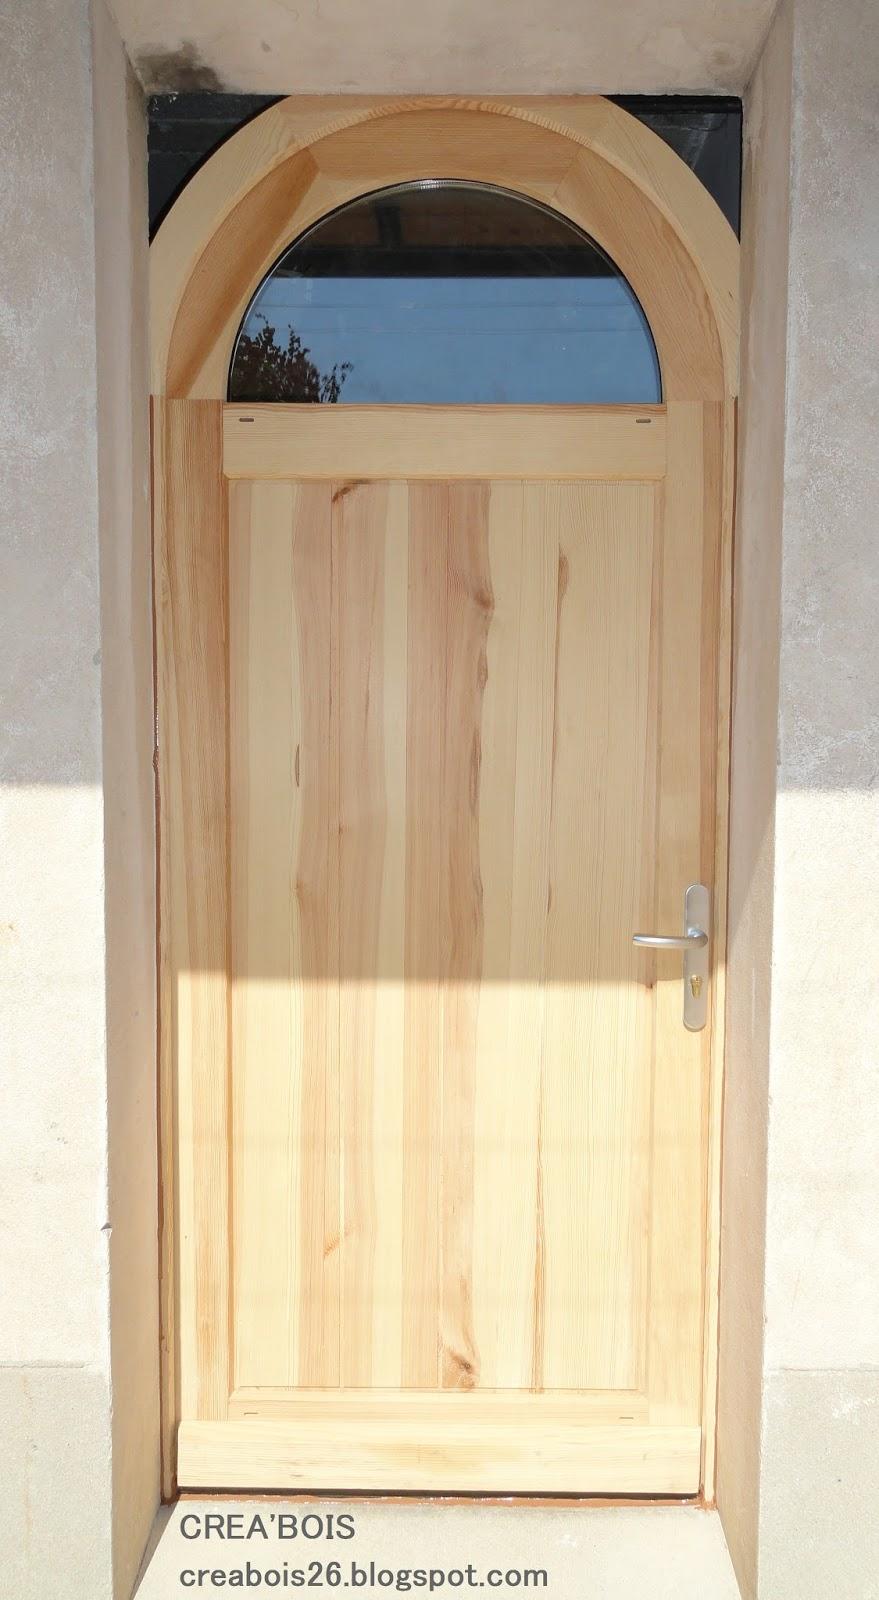 Crea 39 bois portes d 39 entr e - Porte d entree demi ronde ...